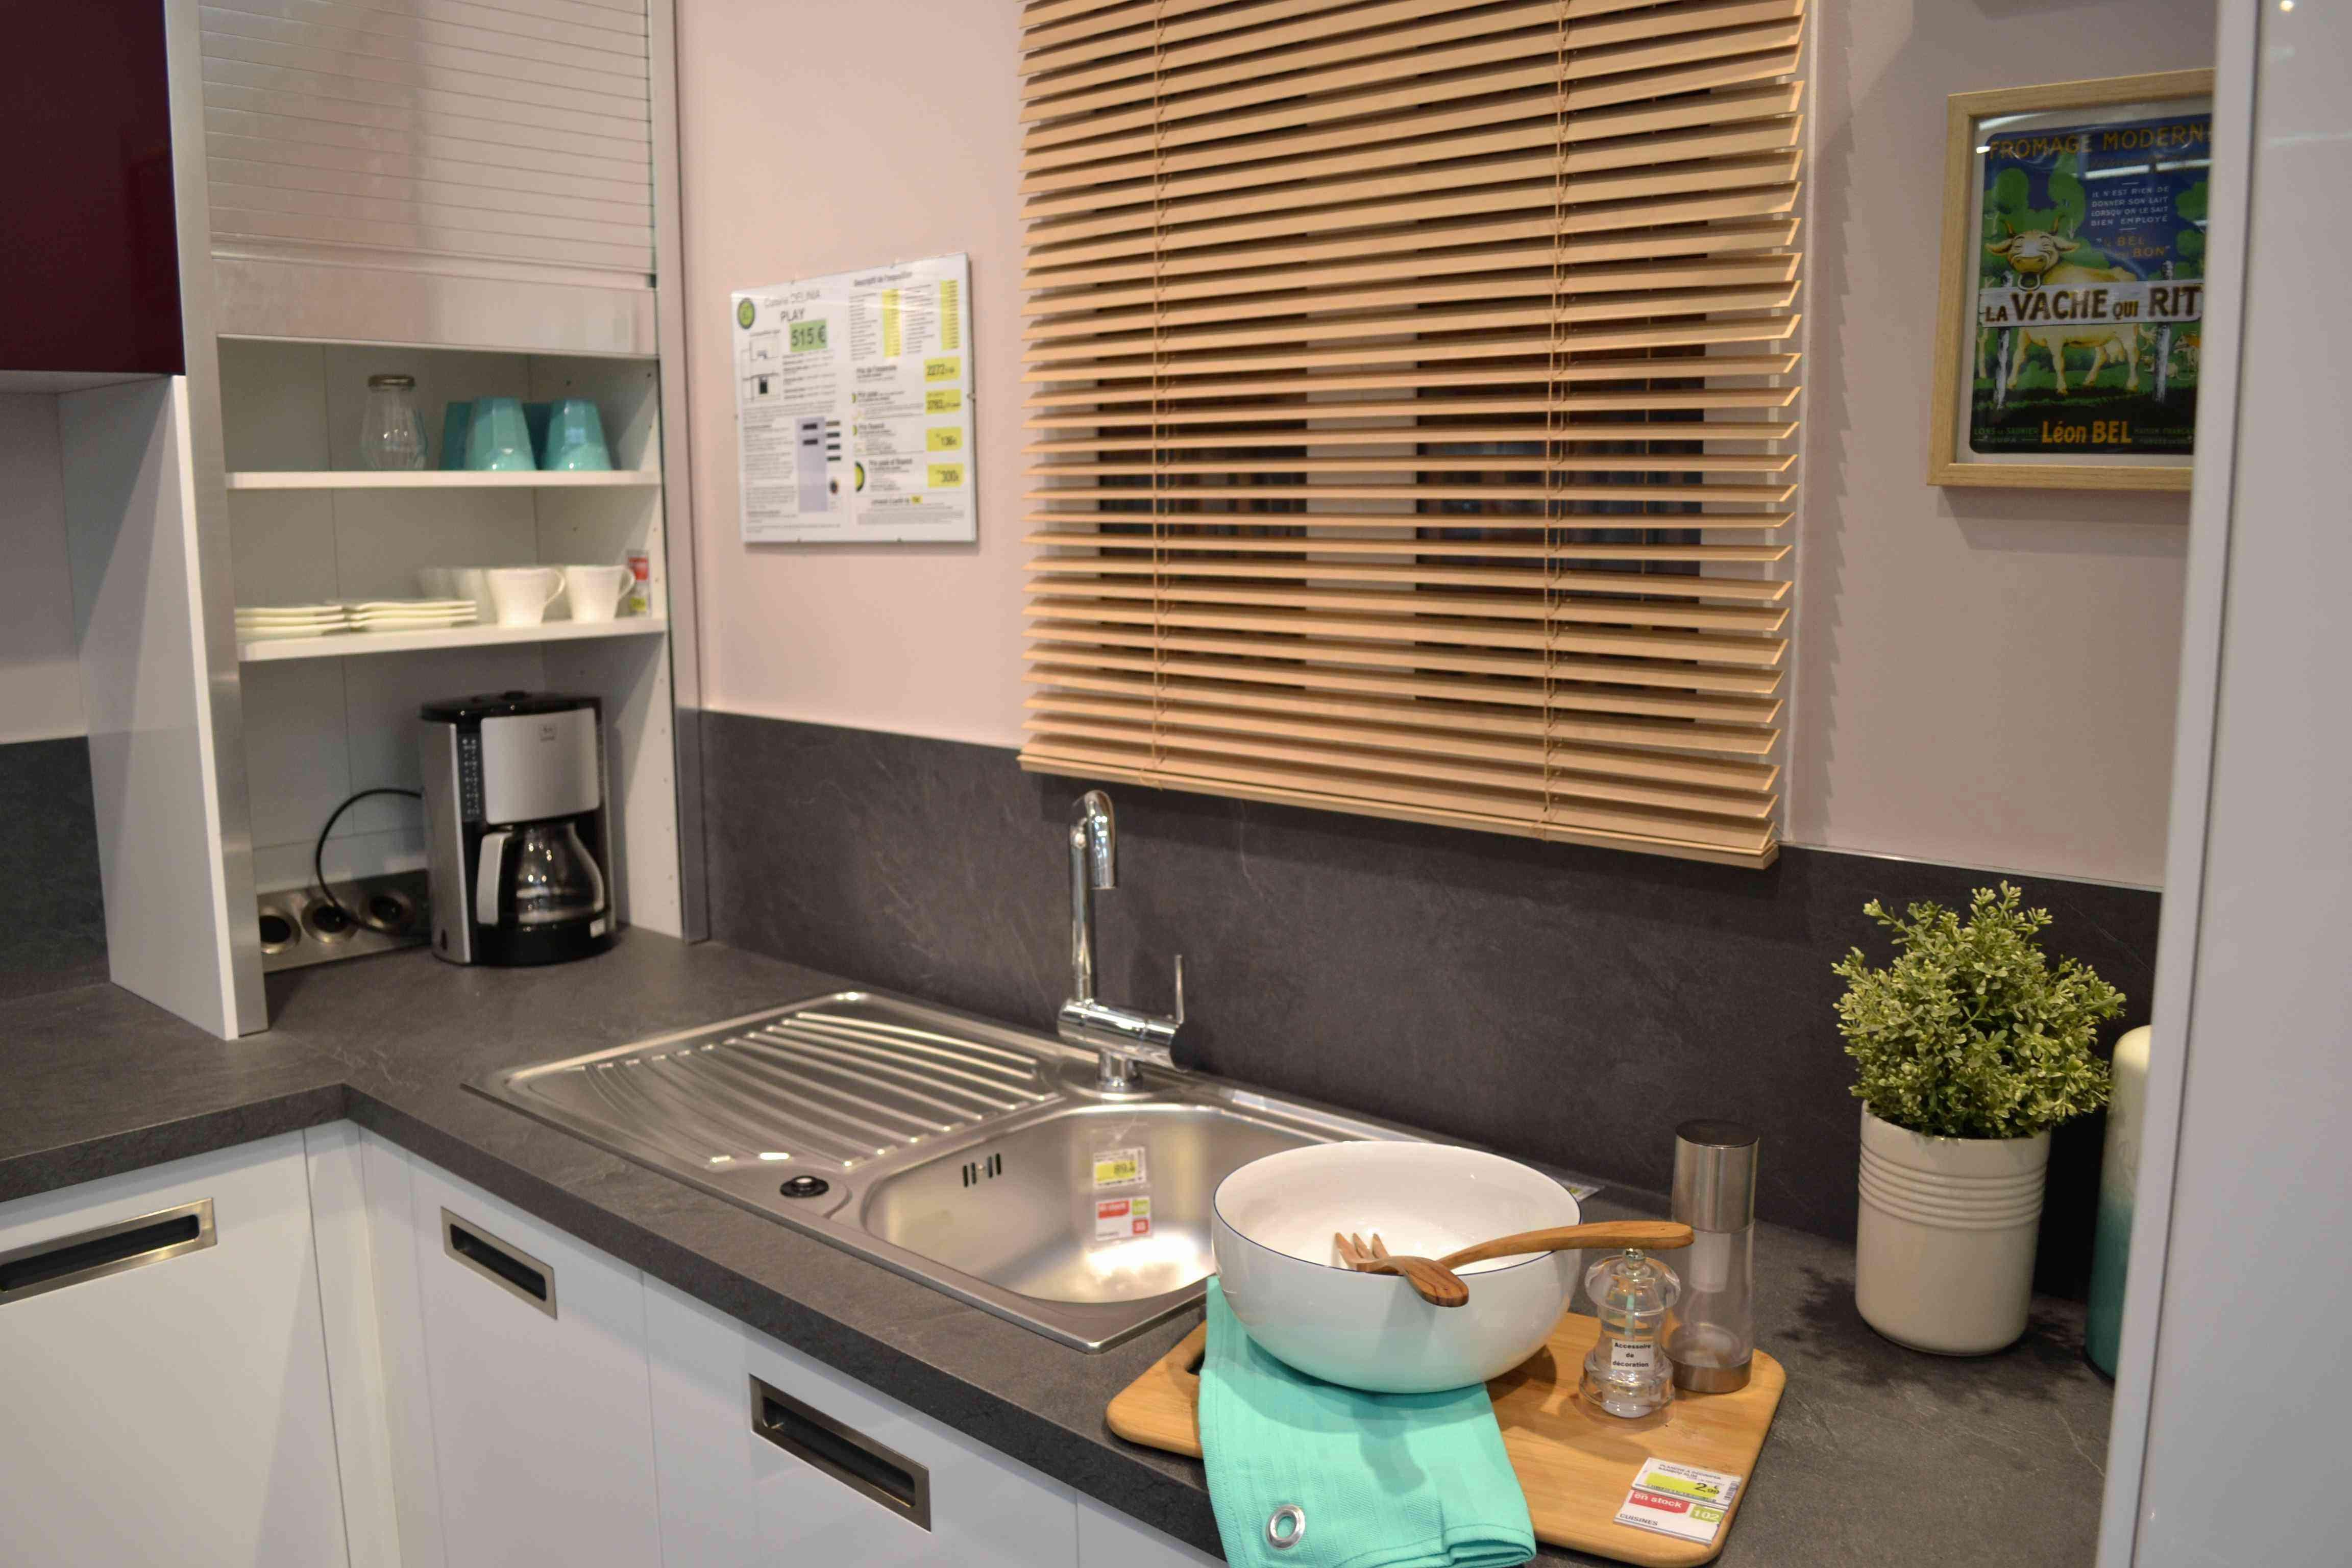 Logiciel Leroy Merlin Salle De Bain Nouveau Photographie Salle De Bain Leroy Merlin 3d Fra Che Logiciel 3d Cuisine Leroy